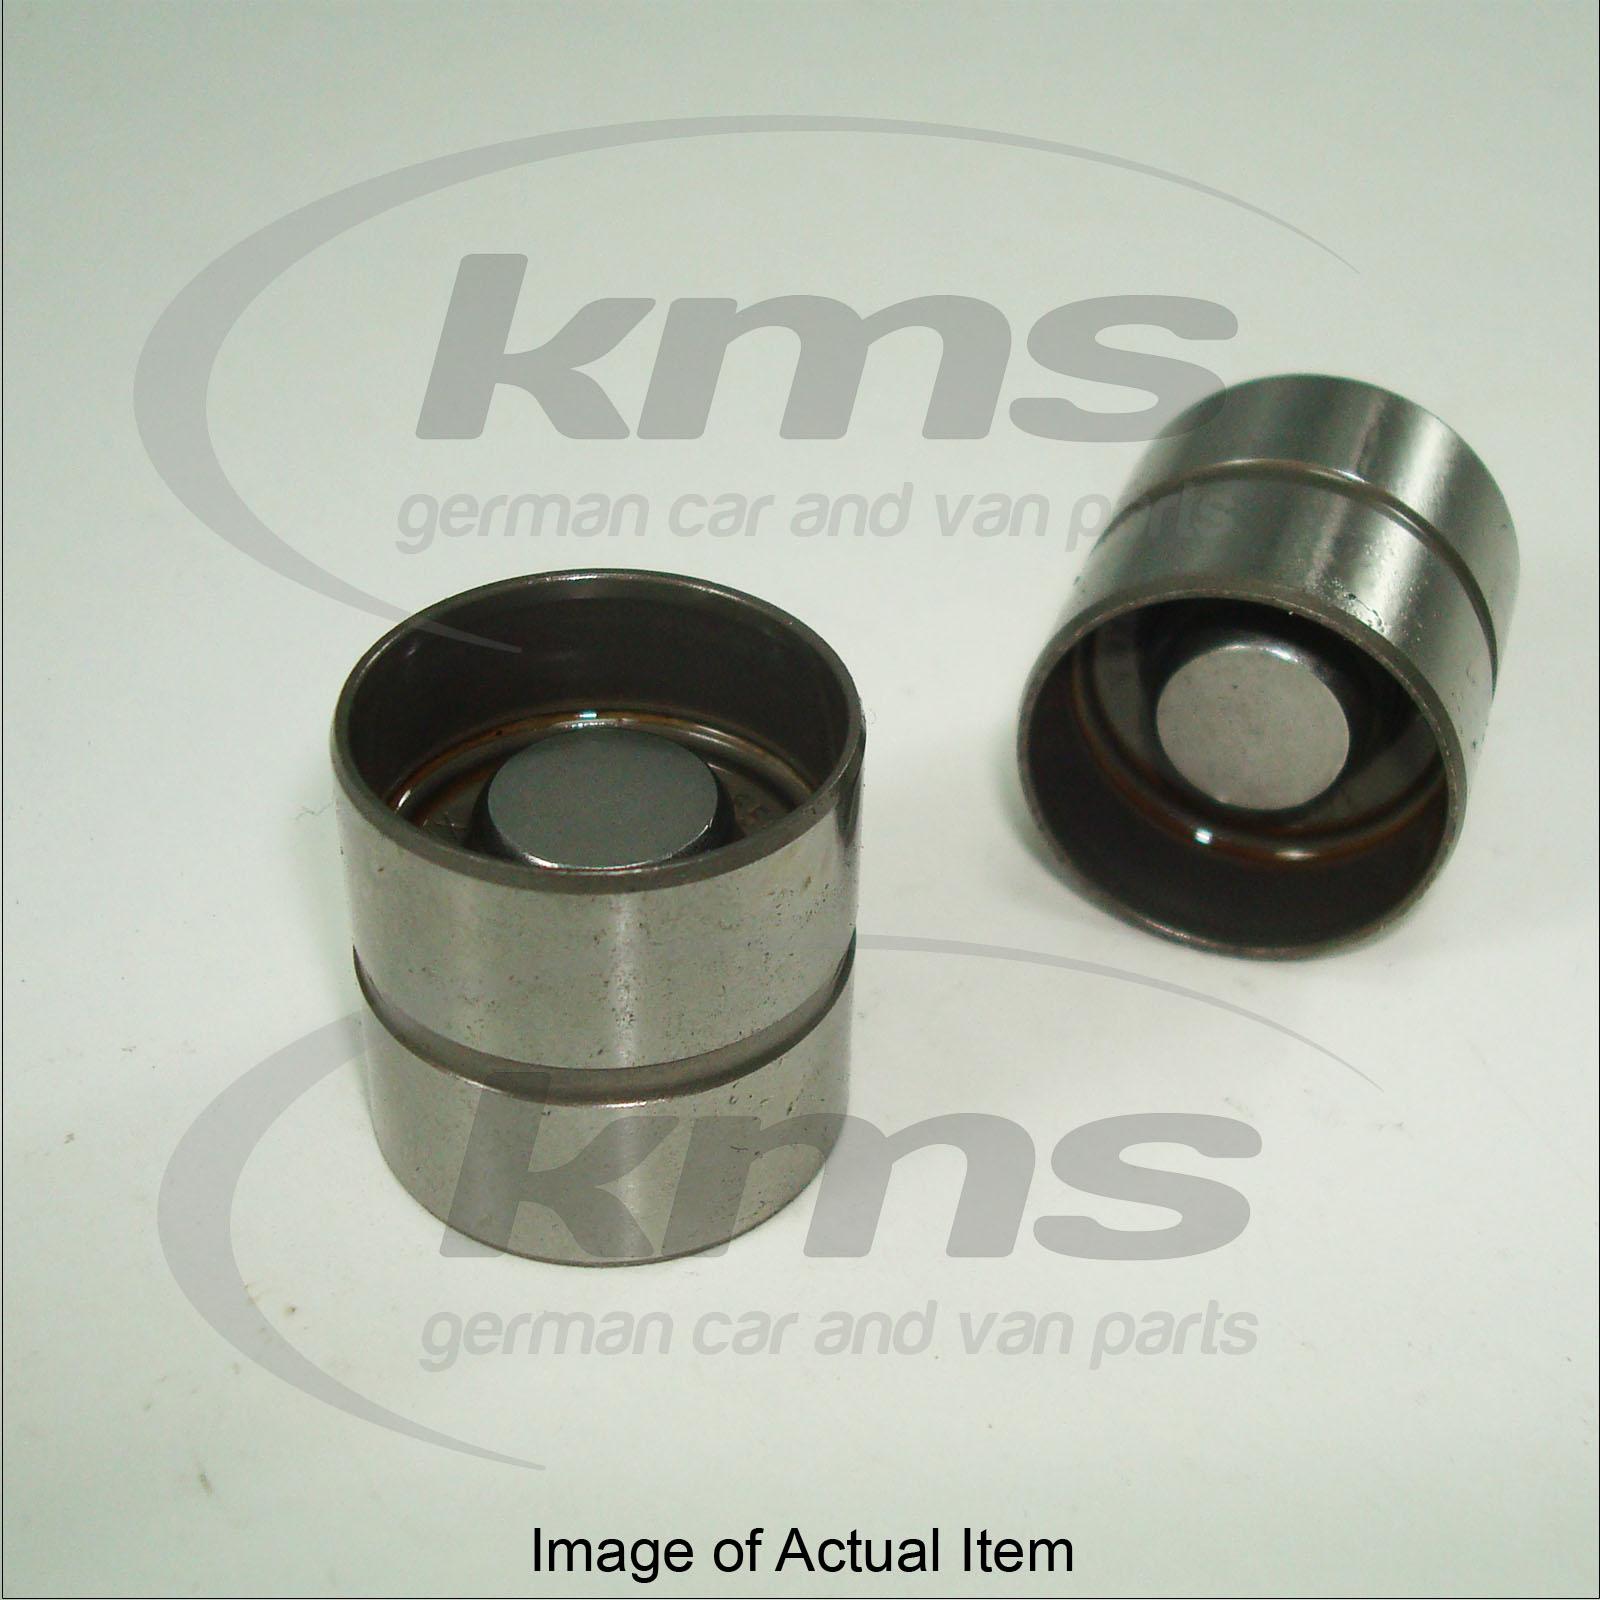 CAM FOLLOWER (HYD) A3,A4,A6,A8,PA4,SH 95- INLET ONLY AUDI A4 SALOON  00-07 SALOO